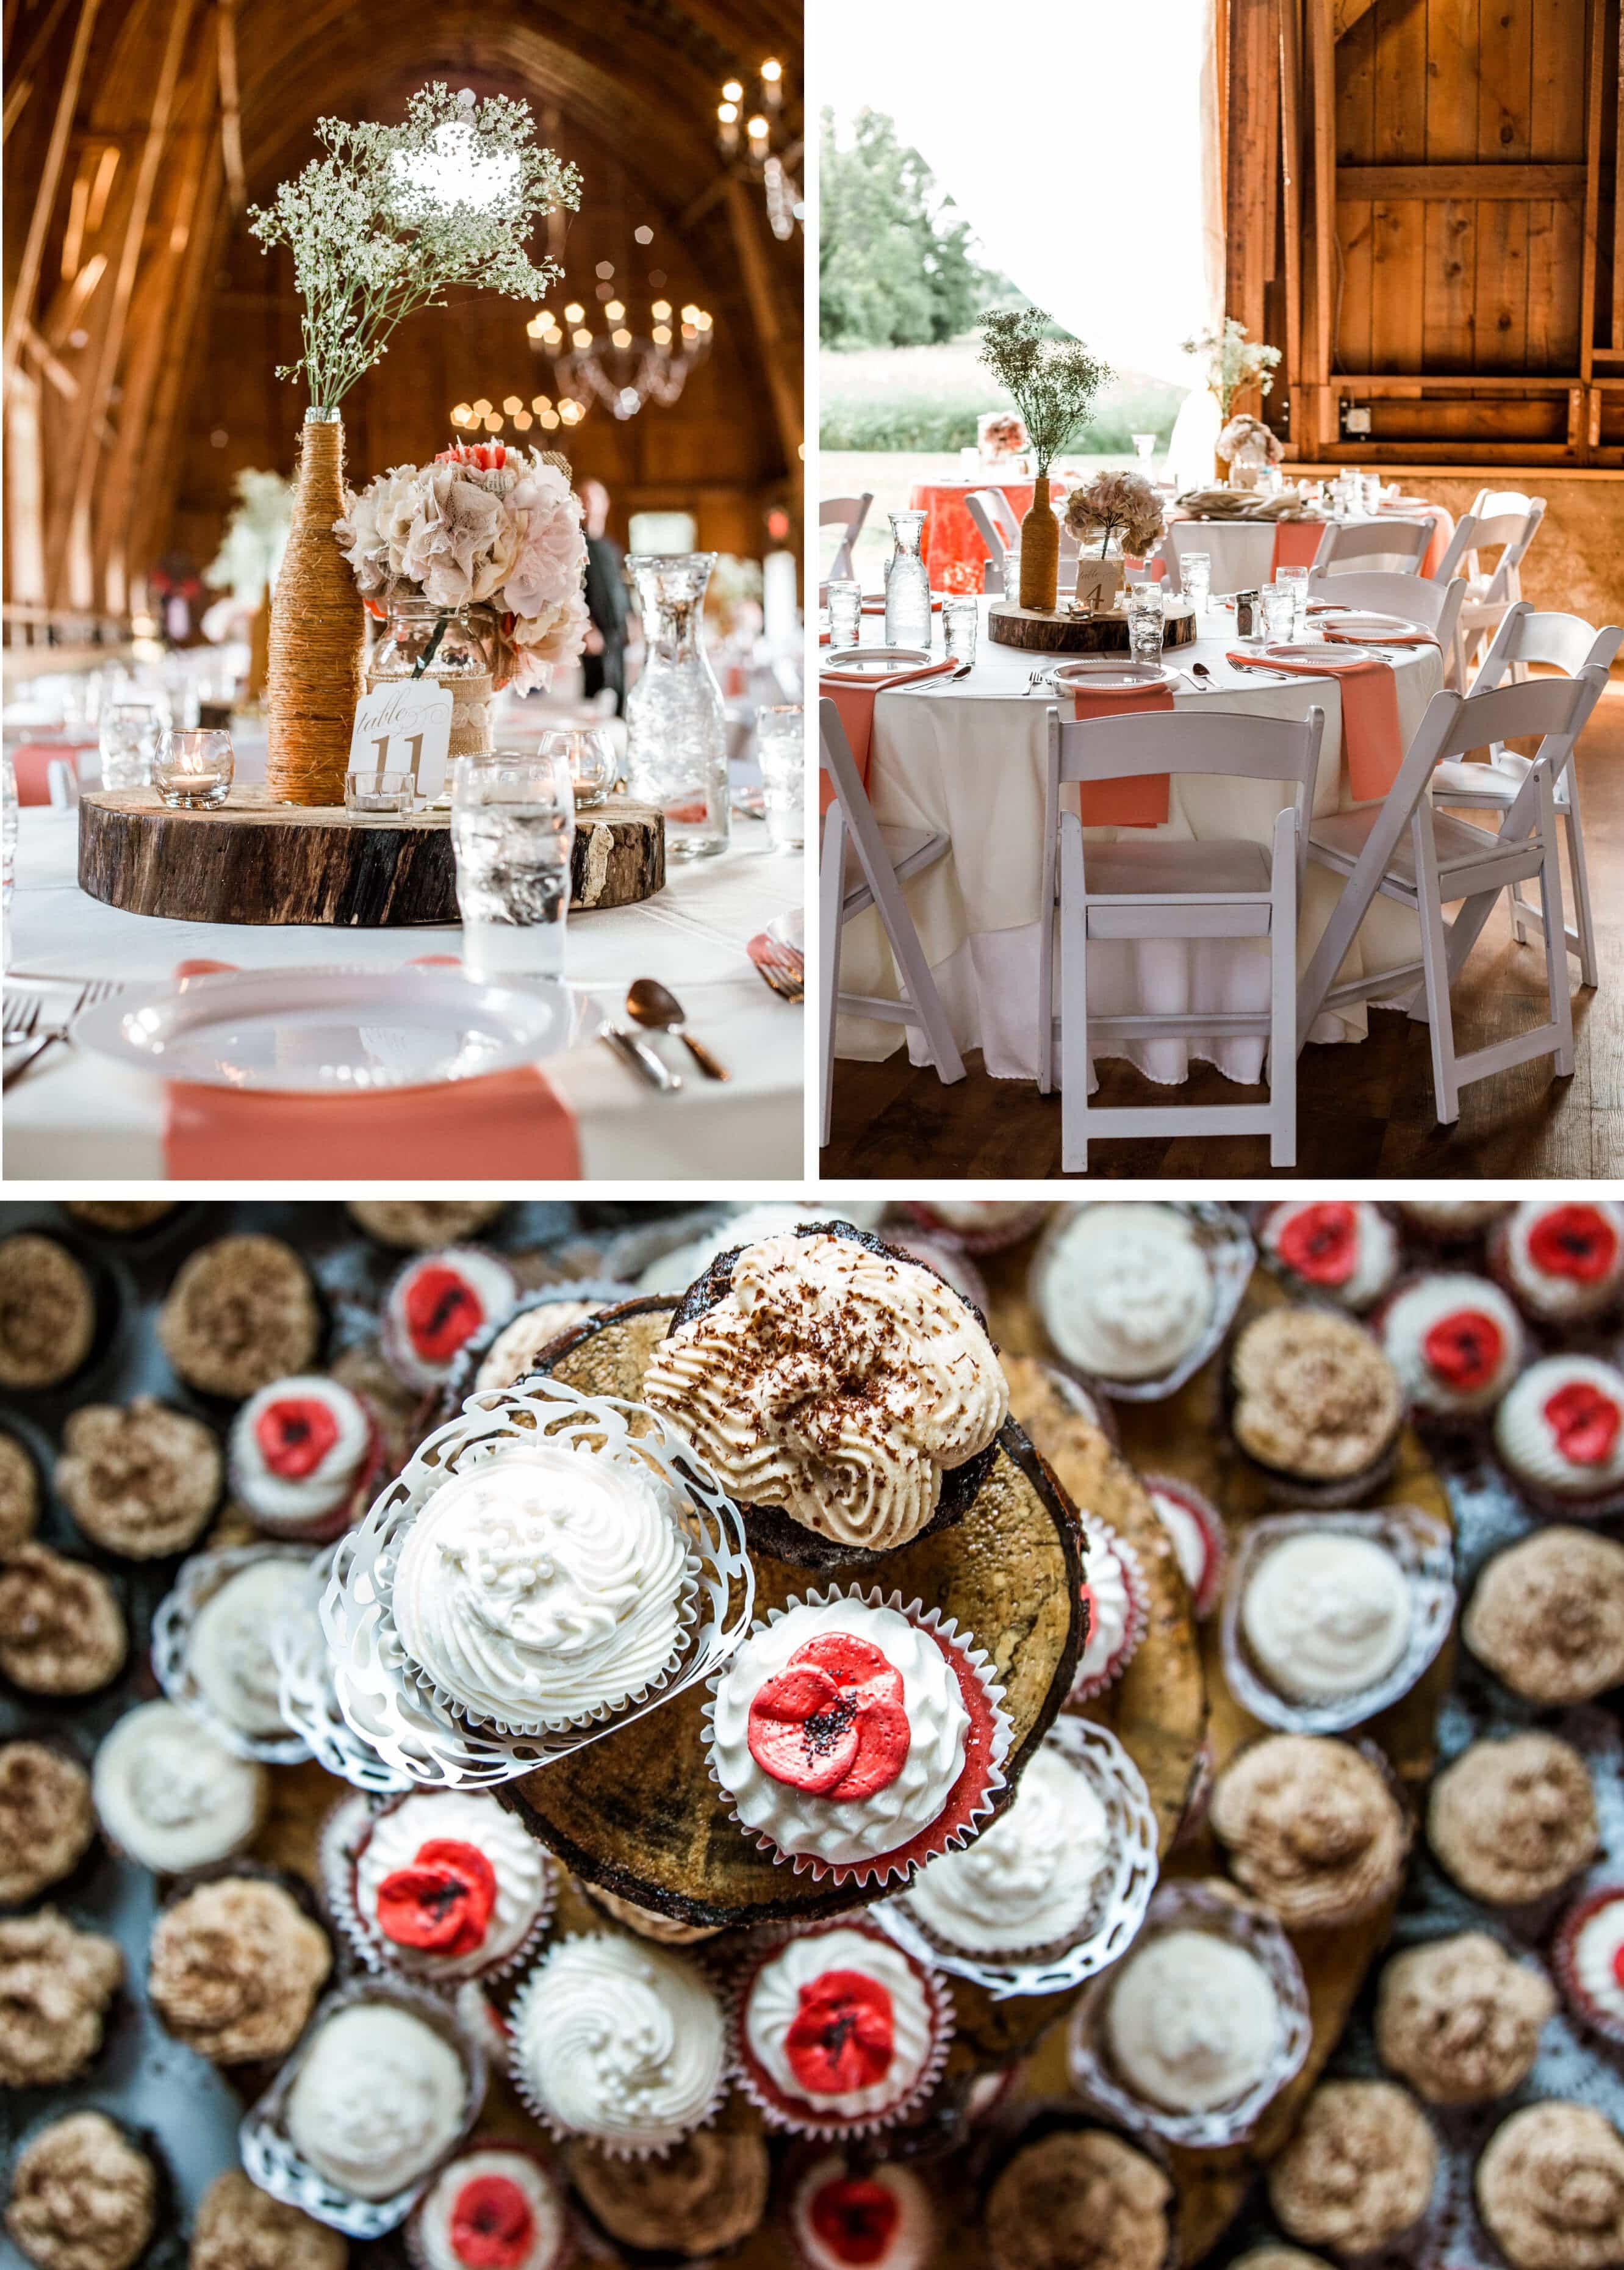 Sussex Wedding Photographer - Barn wedding reception decor